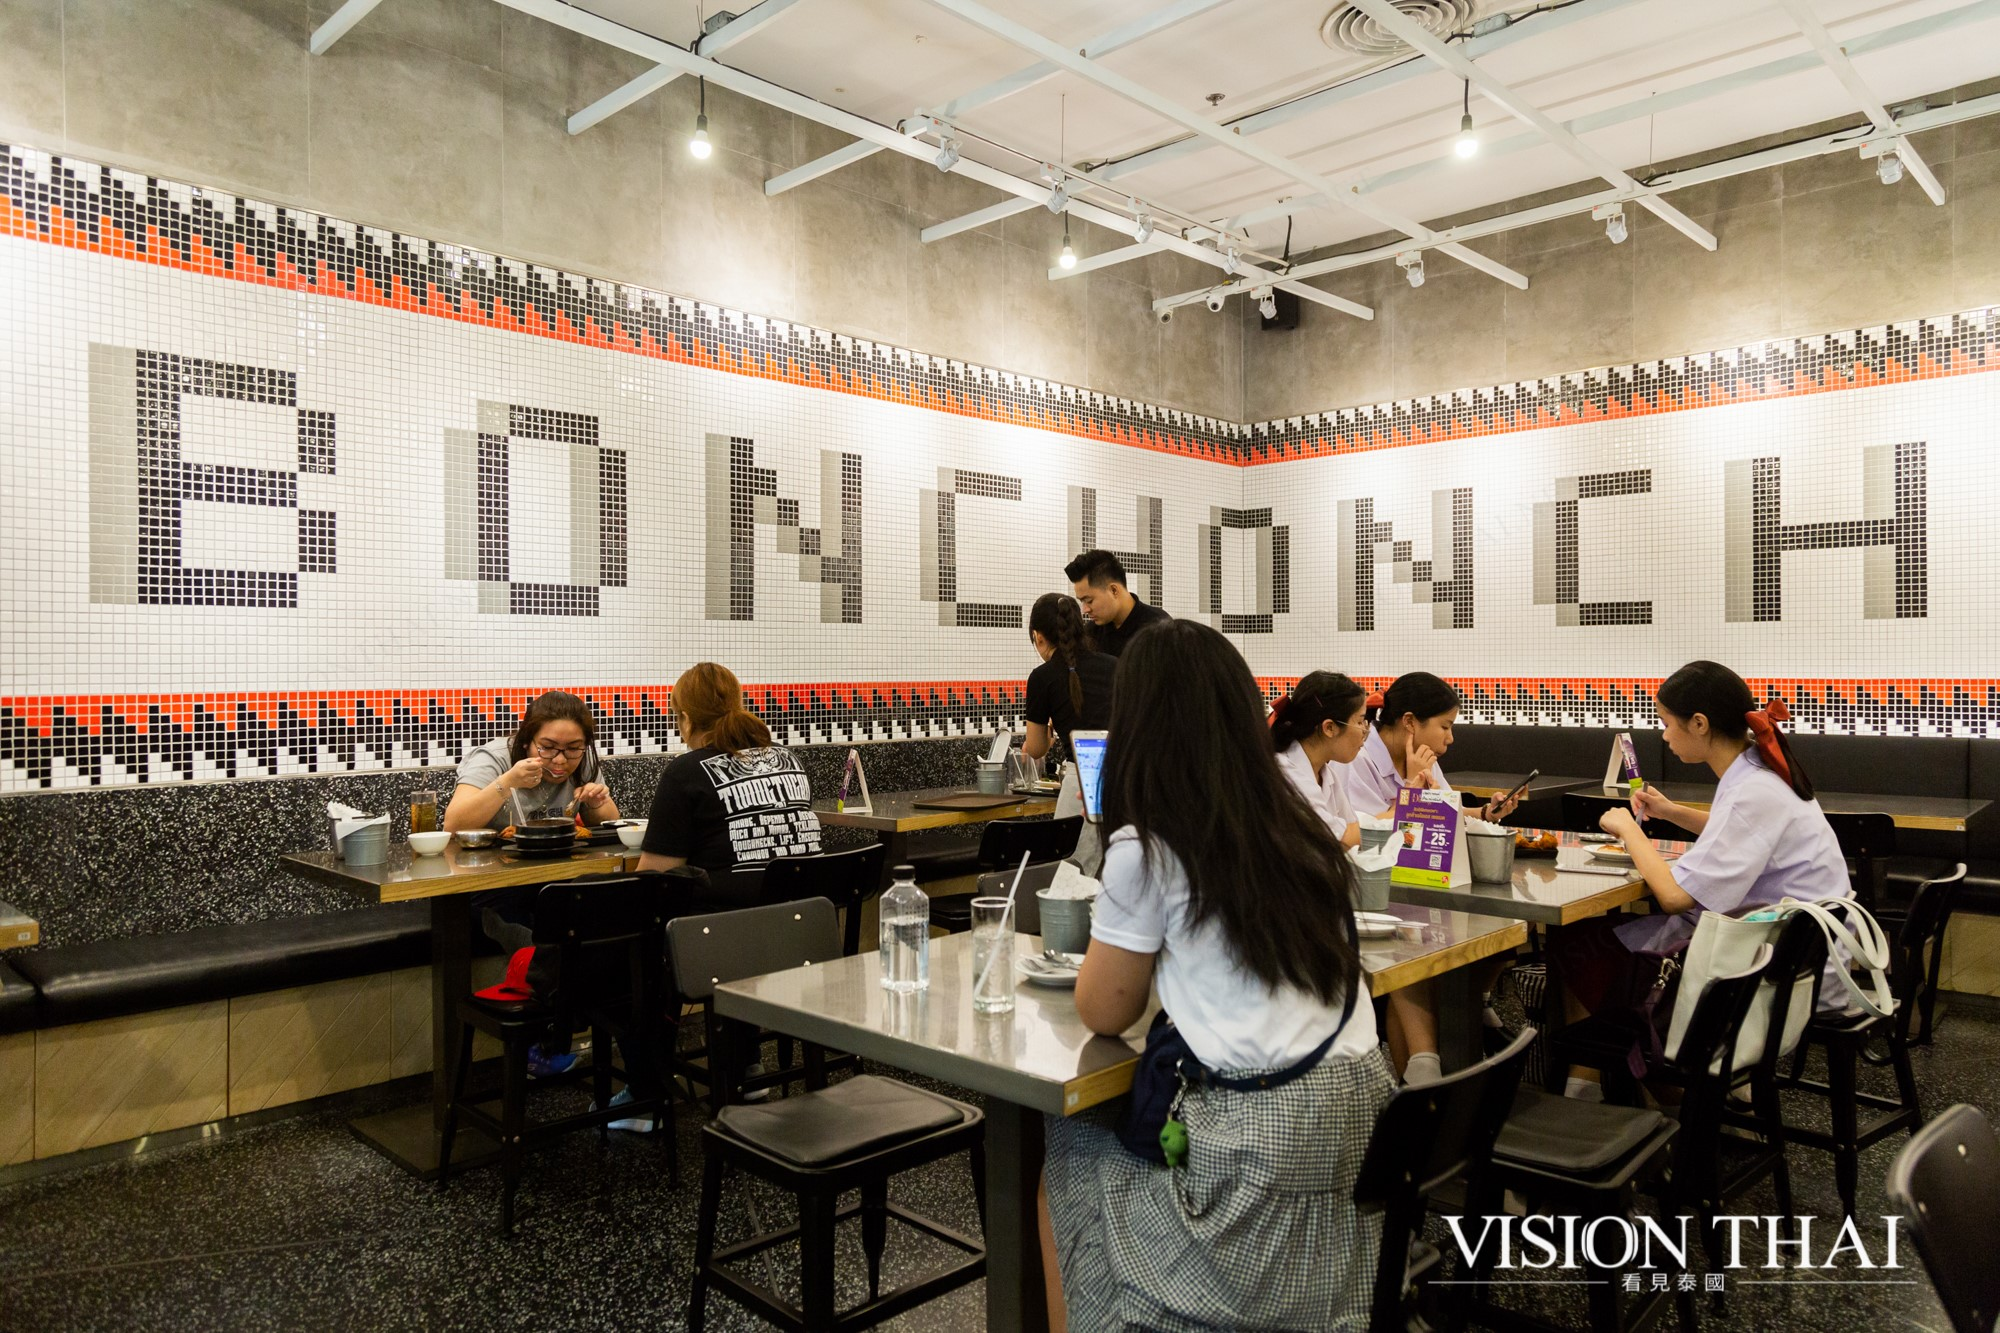 泰國本村炸雞 本村炸雞 BonChon BonChon Thailand 韓式炸雞